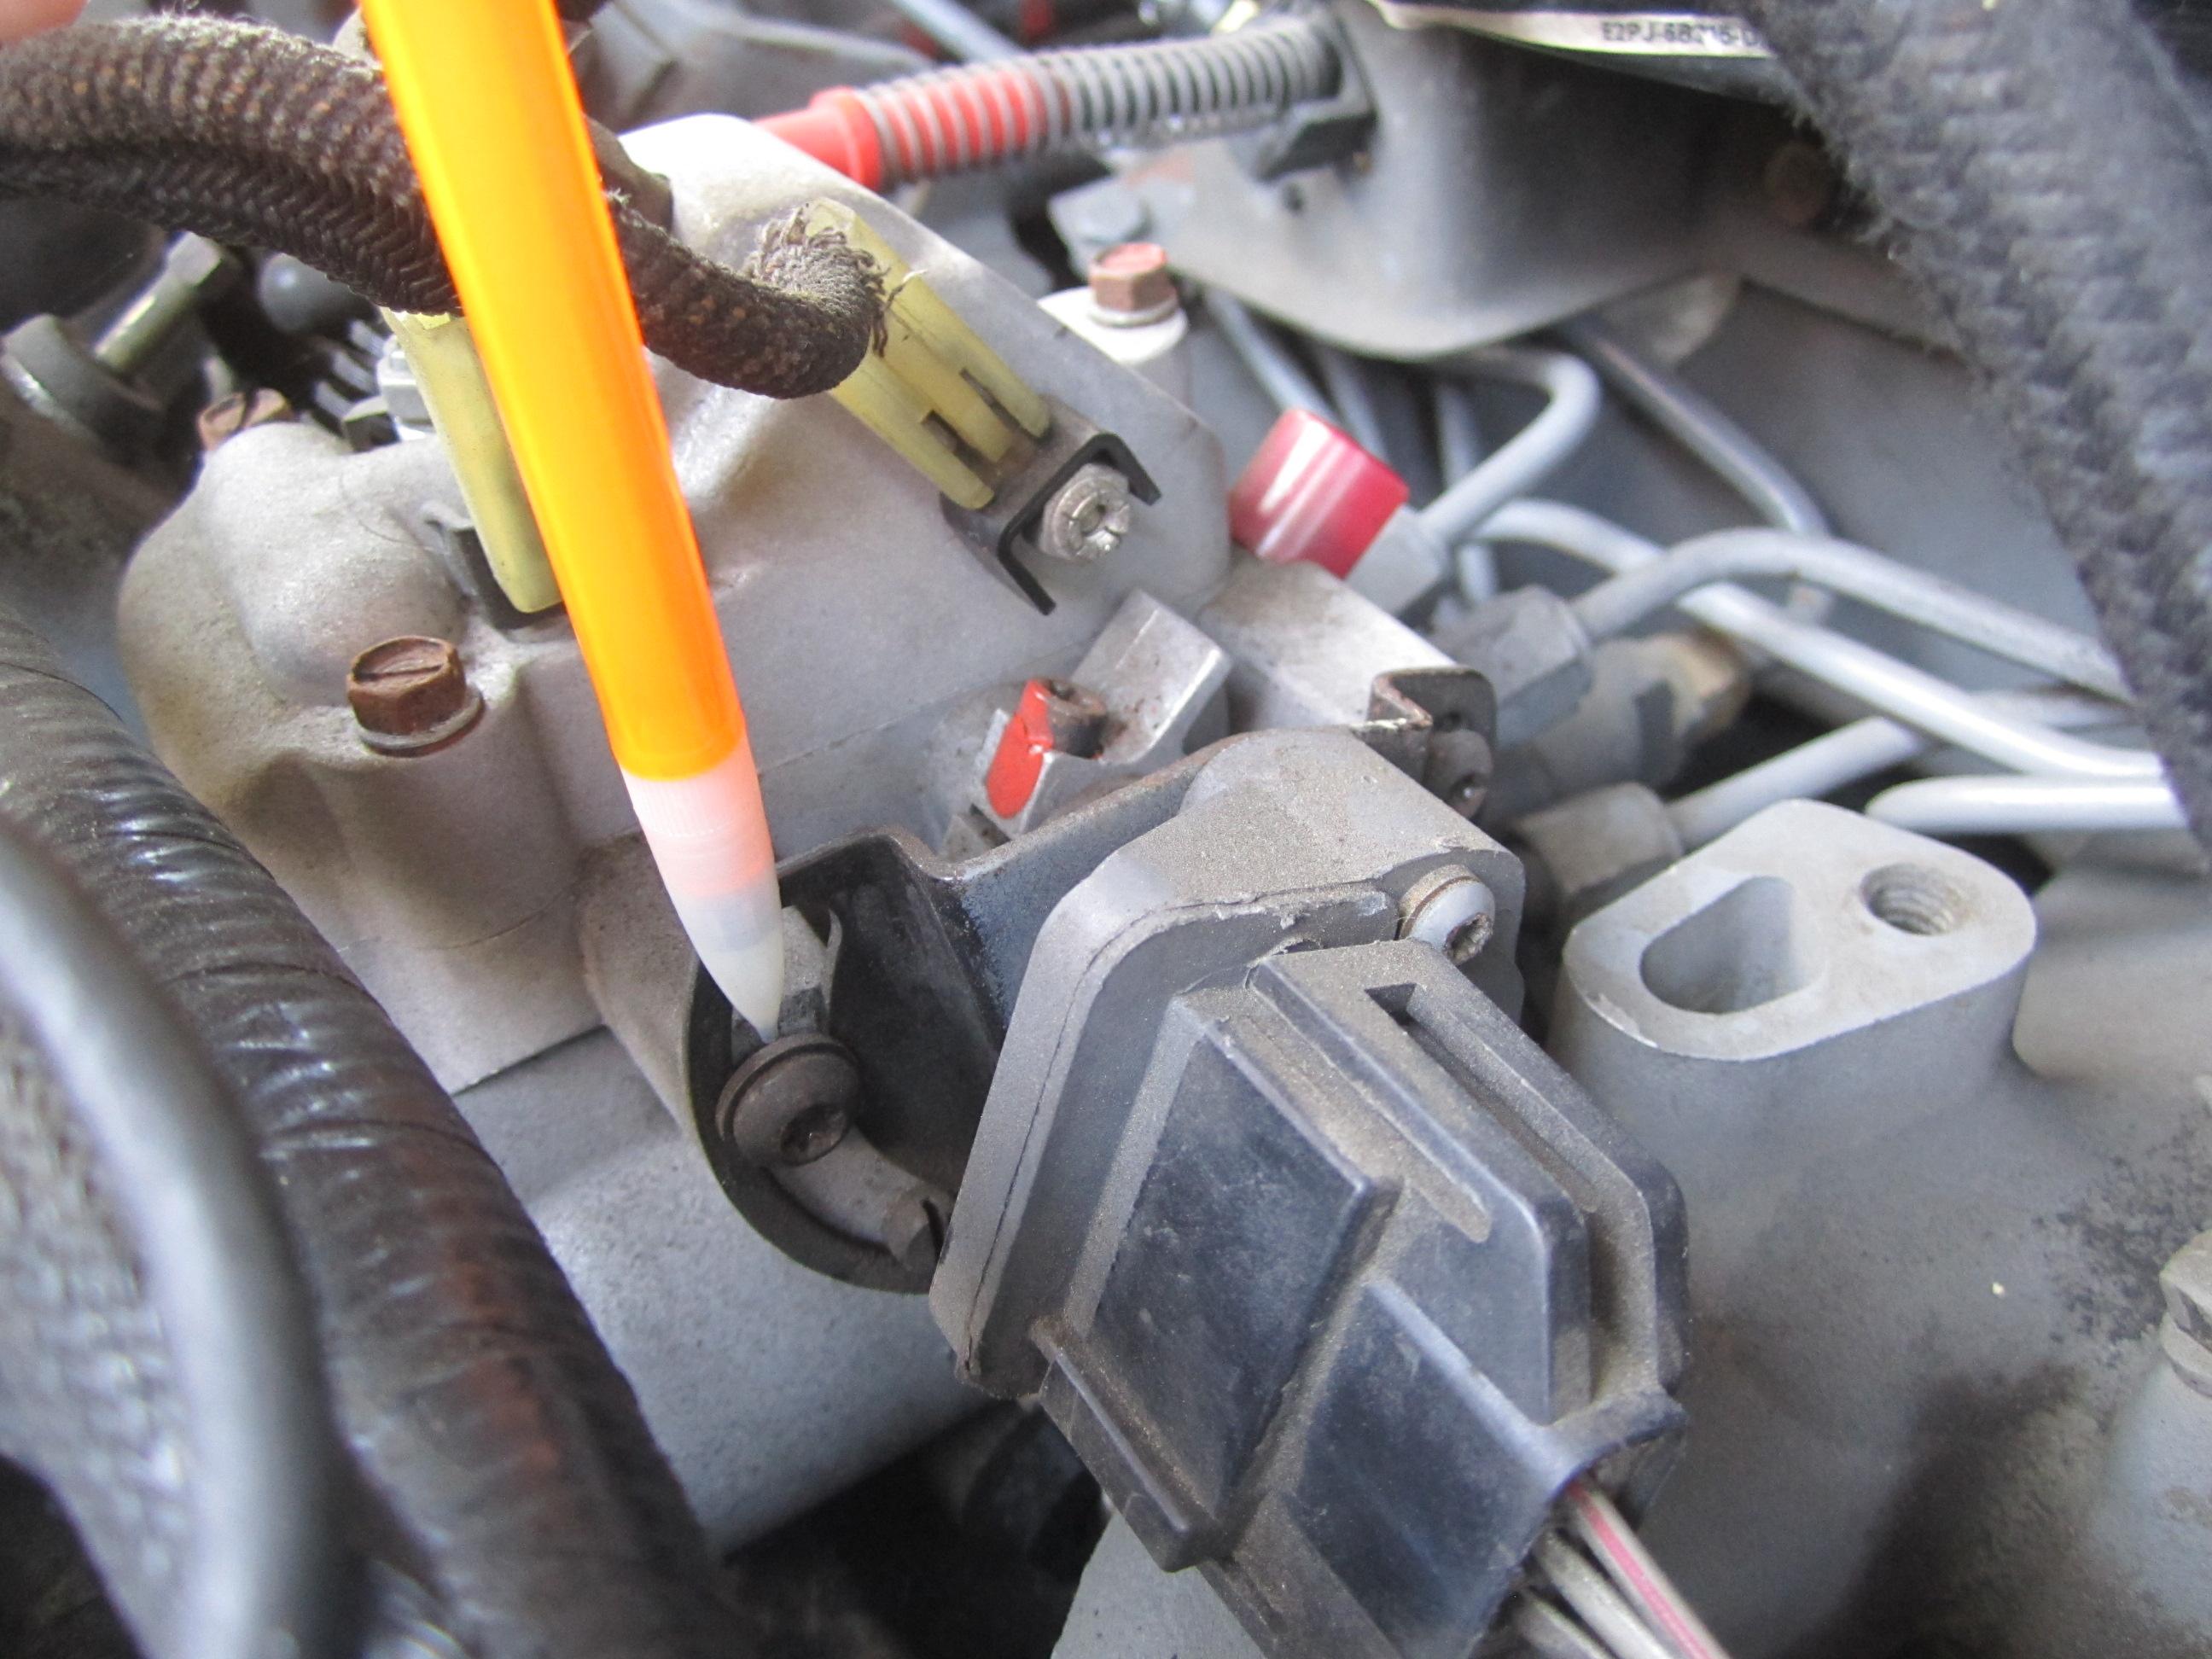 How To Reset Check Engine Light >> sparks flew when adjusting FIPL - Diesel Forum ...